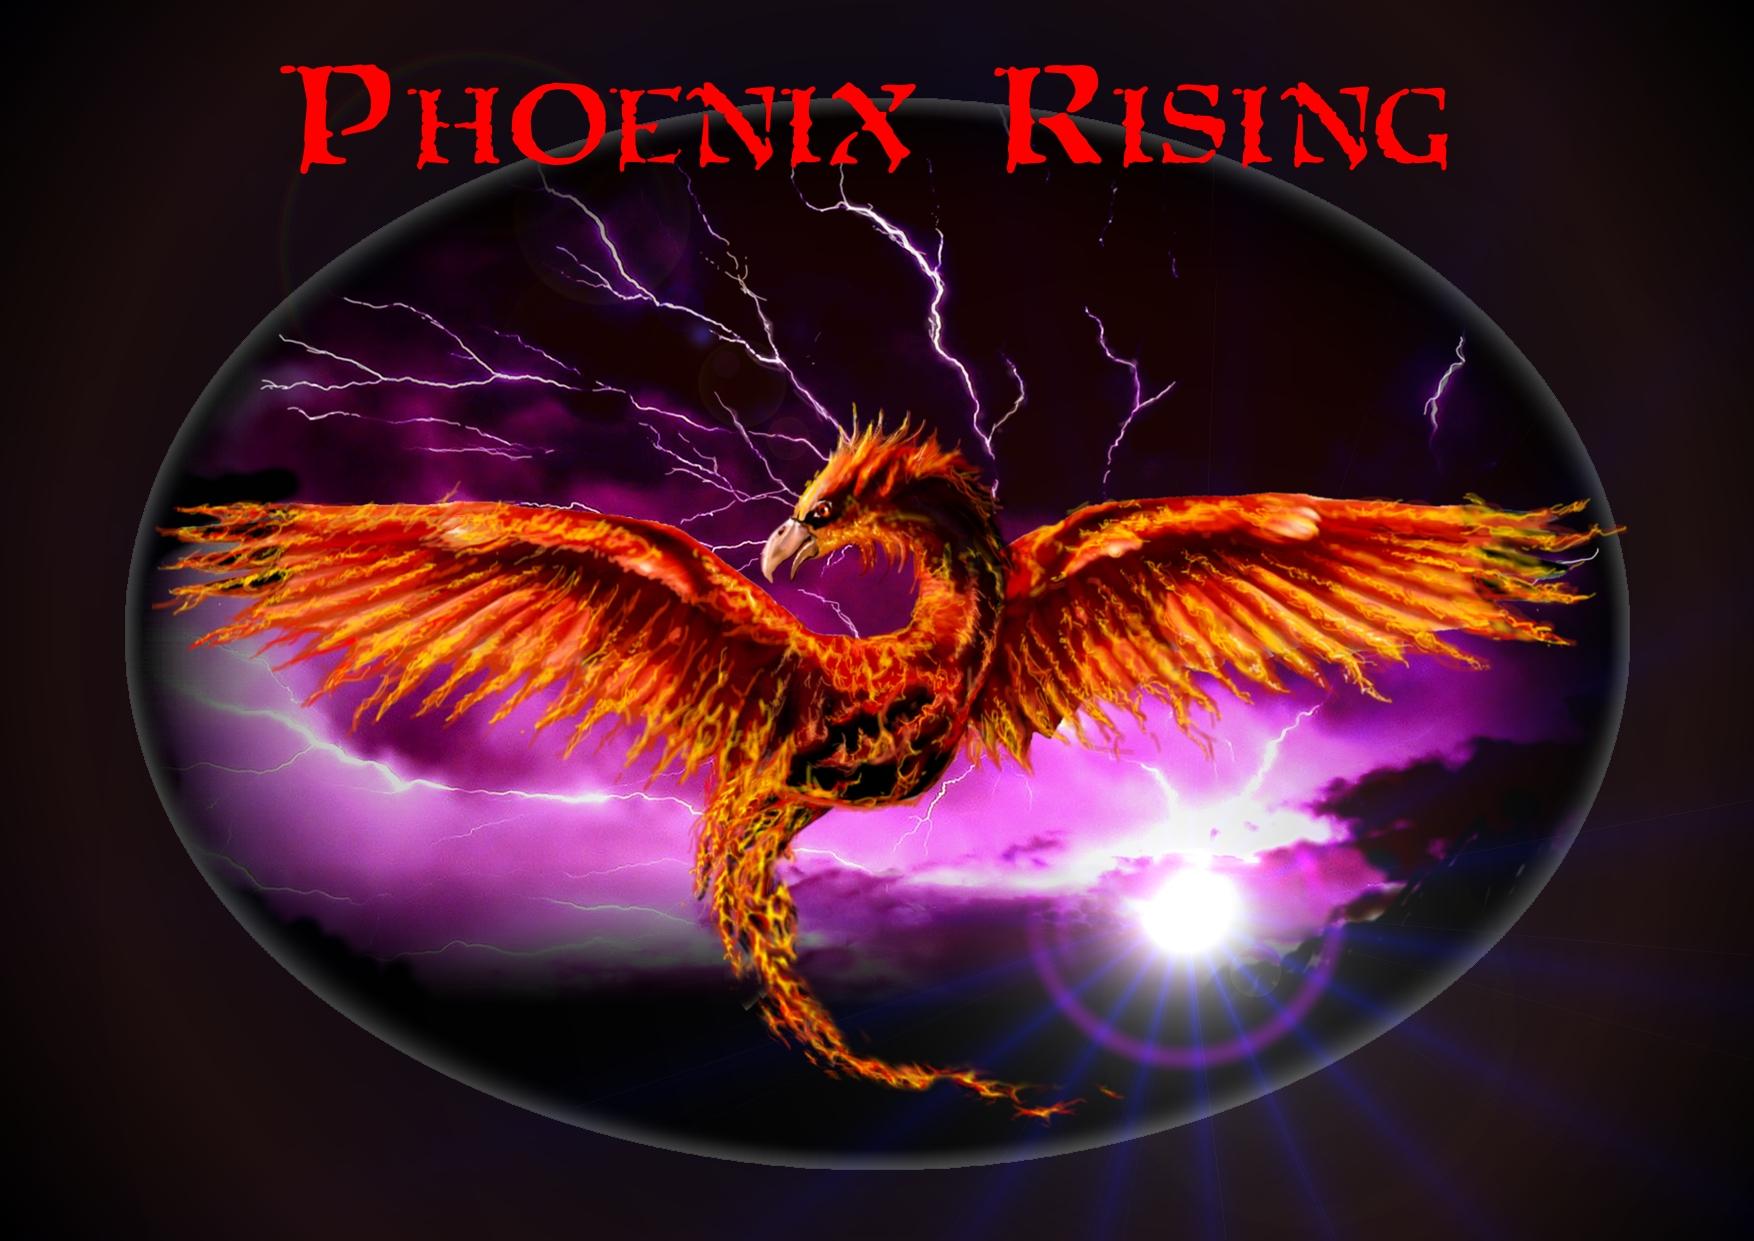 Phoenix rising by cgartner on deviantart phoenix rising by cgartner phoenix rising by cgartner voltagebd Images